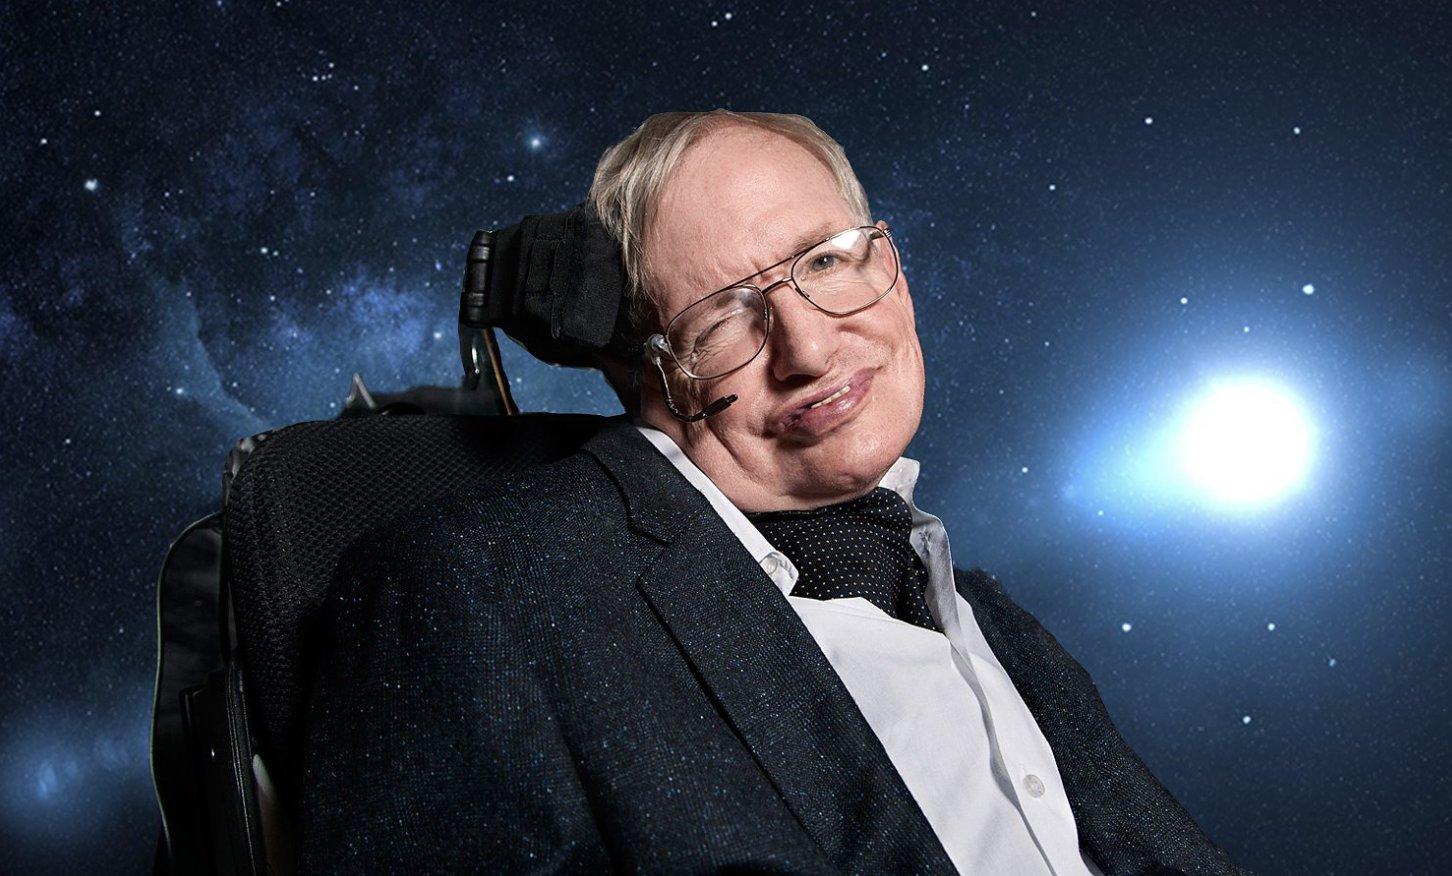 Seven reasons we love Steven Hawking https://t.co/KsJQFJCI1A https://t.co/rNYtPsnNxX